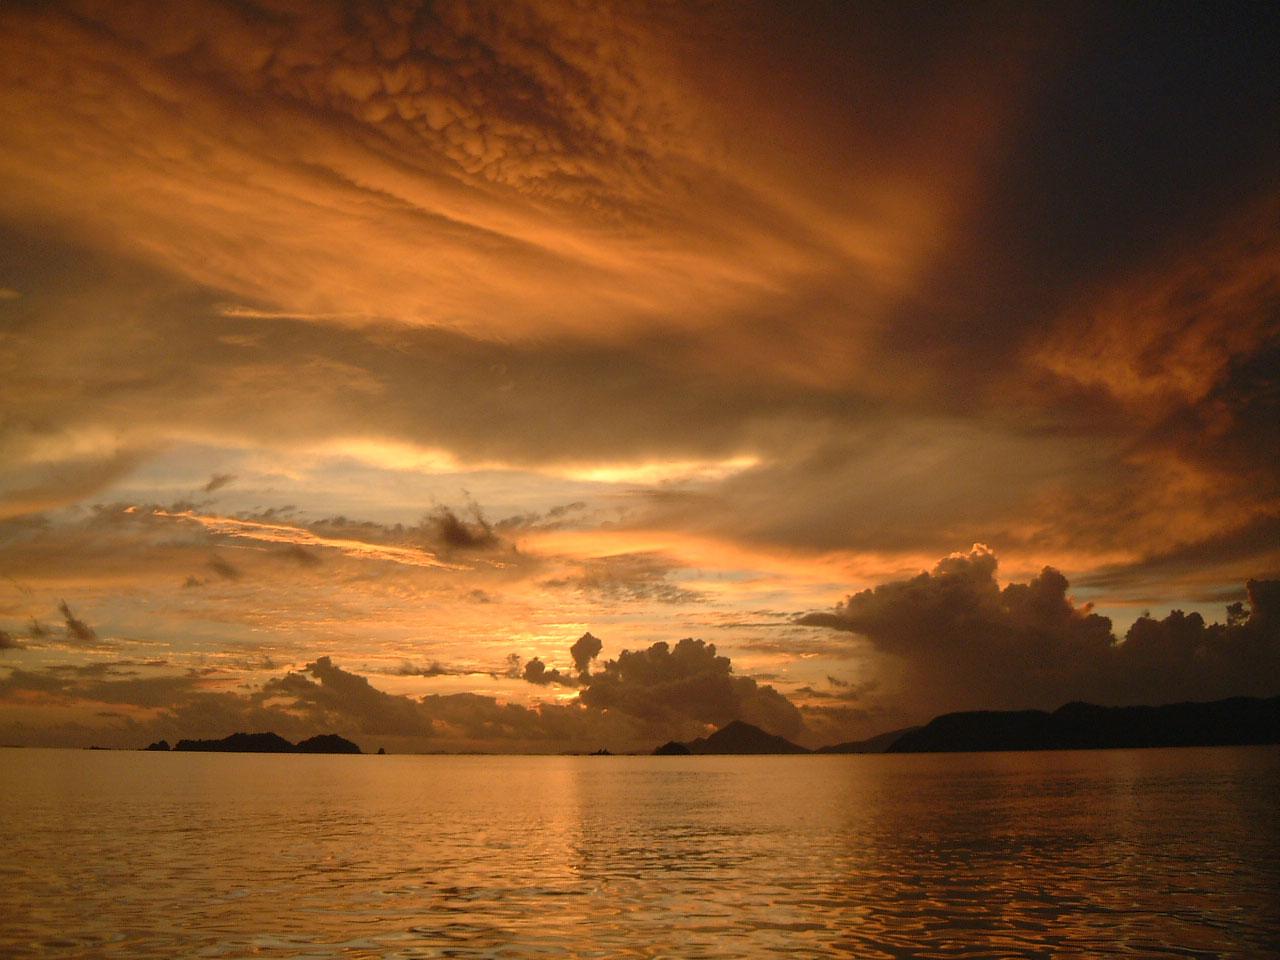 Sunset Philippines Club Paradise 04